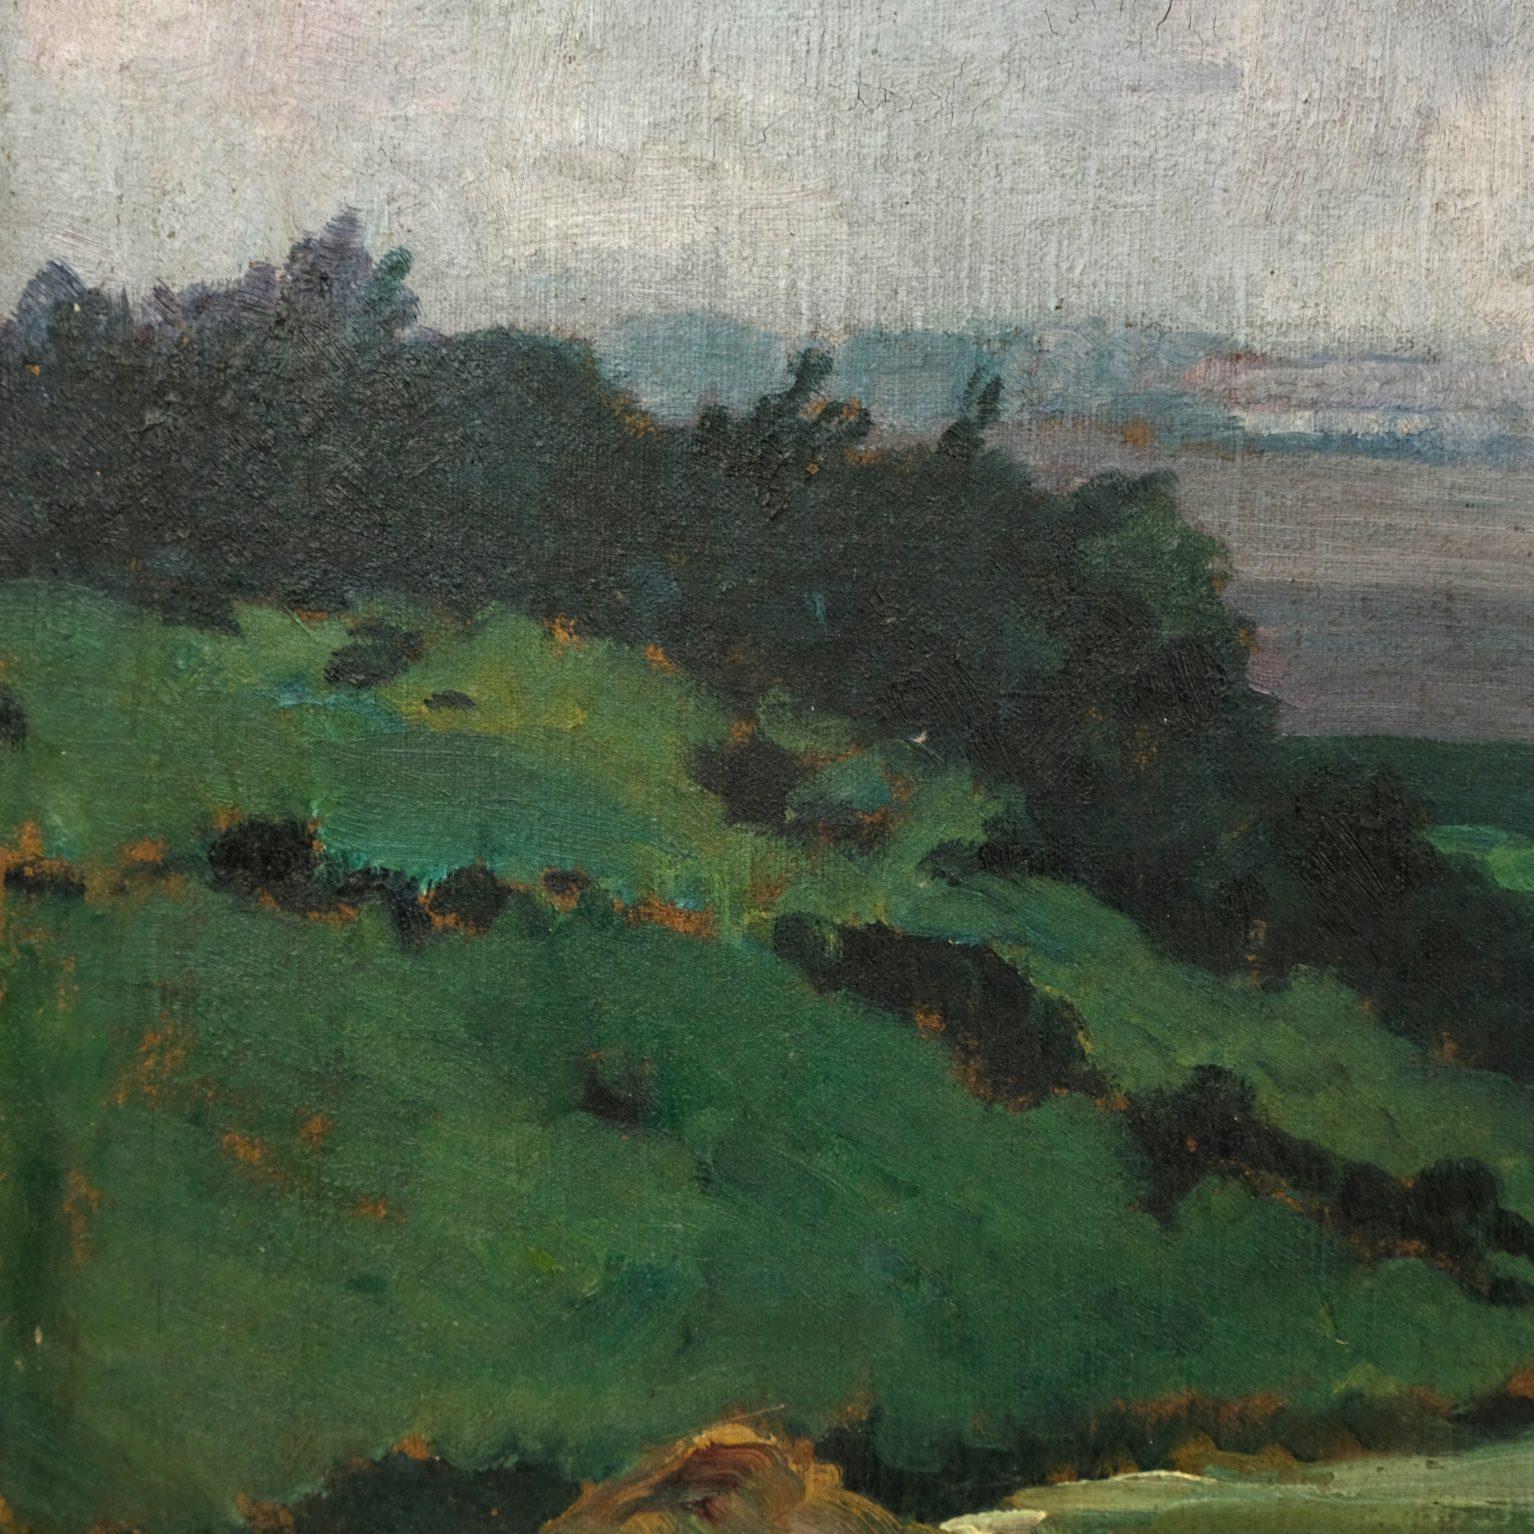 Louis Gustave Cambier (1874-1949) - Calvarie in de Ardennen